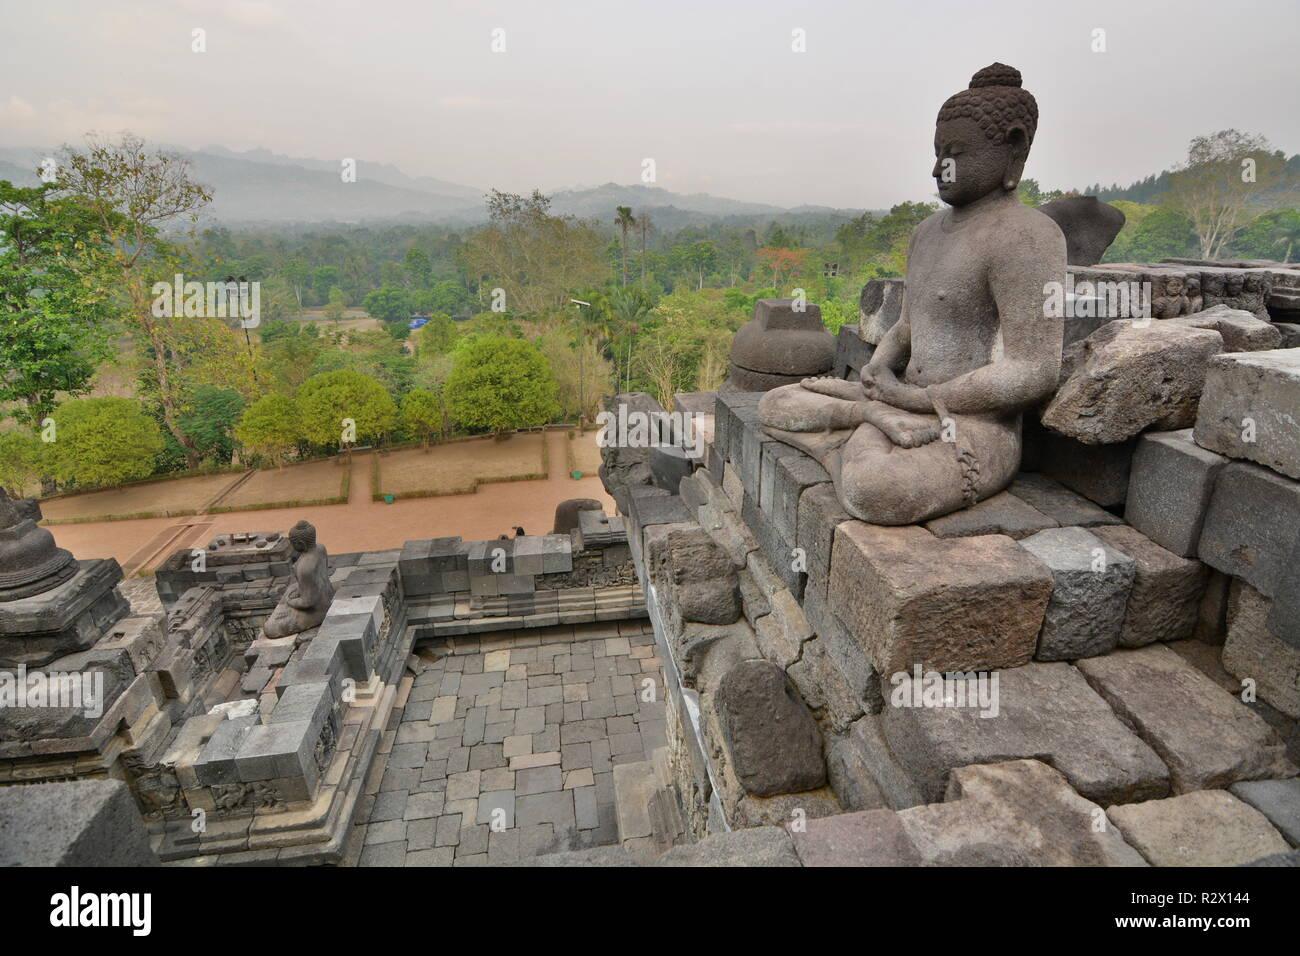 Borobudur buddhist temple. Magelang. Central Java. Indonesia - Stock Image